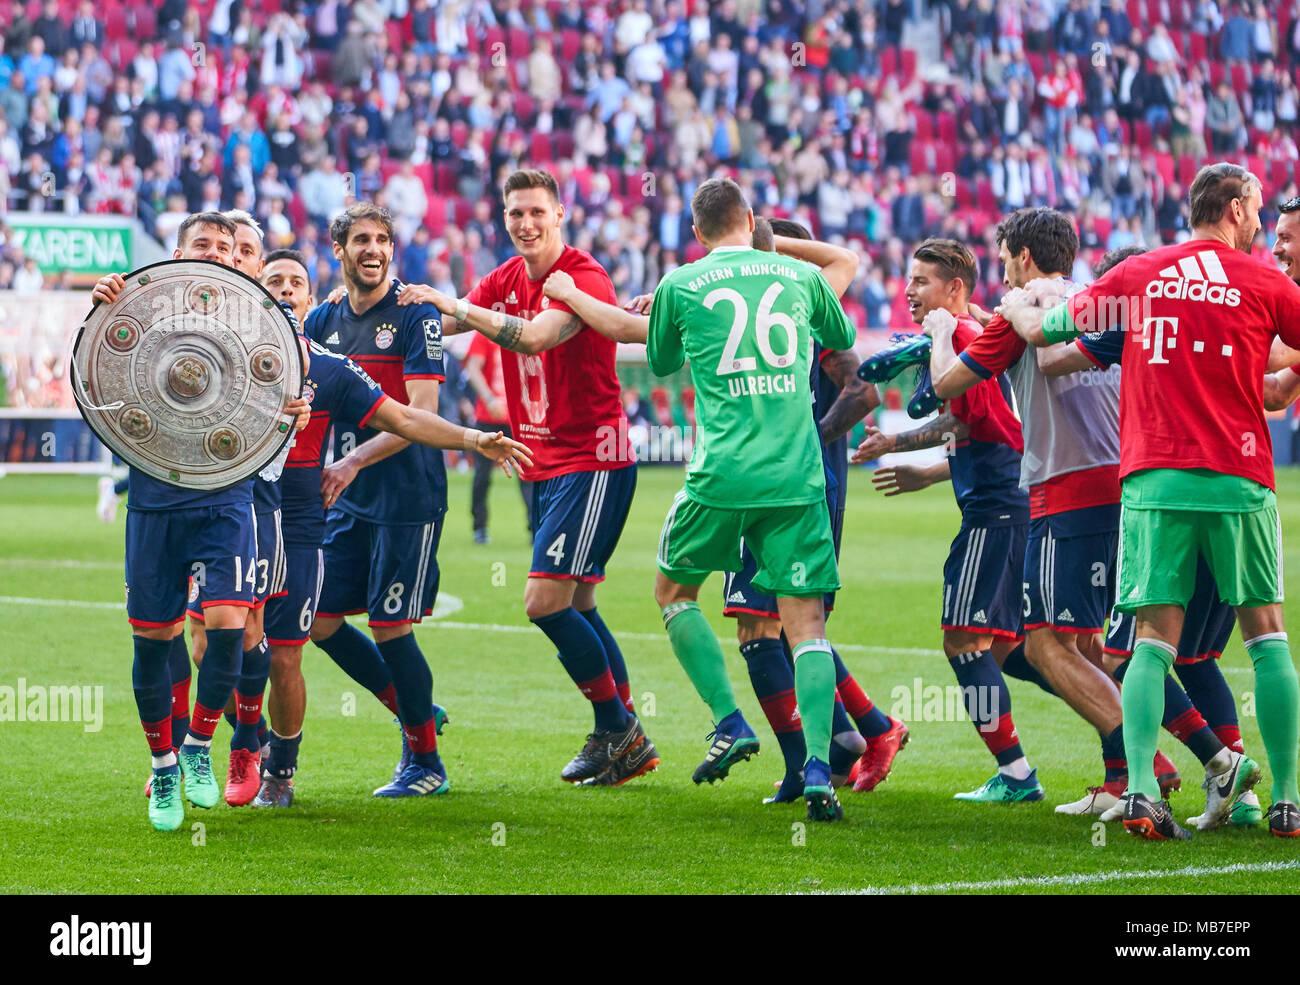 Augsburg, Germany. 7th April, 2018. FC Bayern Munich Soccer, Munich, April 07, 2018 Juan BERNAT, FCB 14 RAFINHA (FCB 13) Thiago ALCANTARA, FCB 6  Javi MARTINEZ, FCB 8 Niklas SUELE, FCB 4 James RODRIGUEZ, FCB 11 Mats HUMMELS, FCB 5  Sandro WAGNER, FCB 2 Sebastian RUDY, FCB 19  Tom STARKE, FCB 22 Robert LEWANDOWSKI, FCB 9 Thomas MUELLER, MÜLLER, FCB 25 Arjen ROBBEN, FCB 10 David ALABA, FCB 27 Franck RIBERY, FCB 7   celebration FC AUGSBURG - FC BAYERN MUNICH 1-4 1.German Soccer League , Augsburg, April 07, 2018,  Season 2017/2018 © Peter Schatz / Alamy Live News Stock Photo